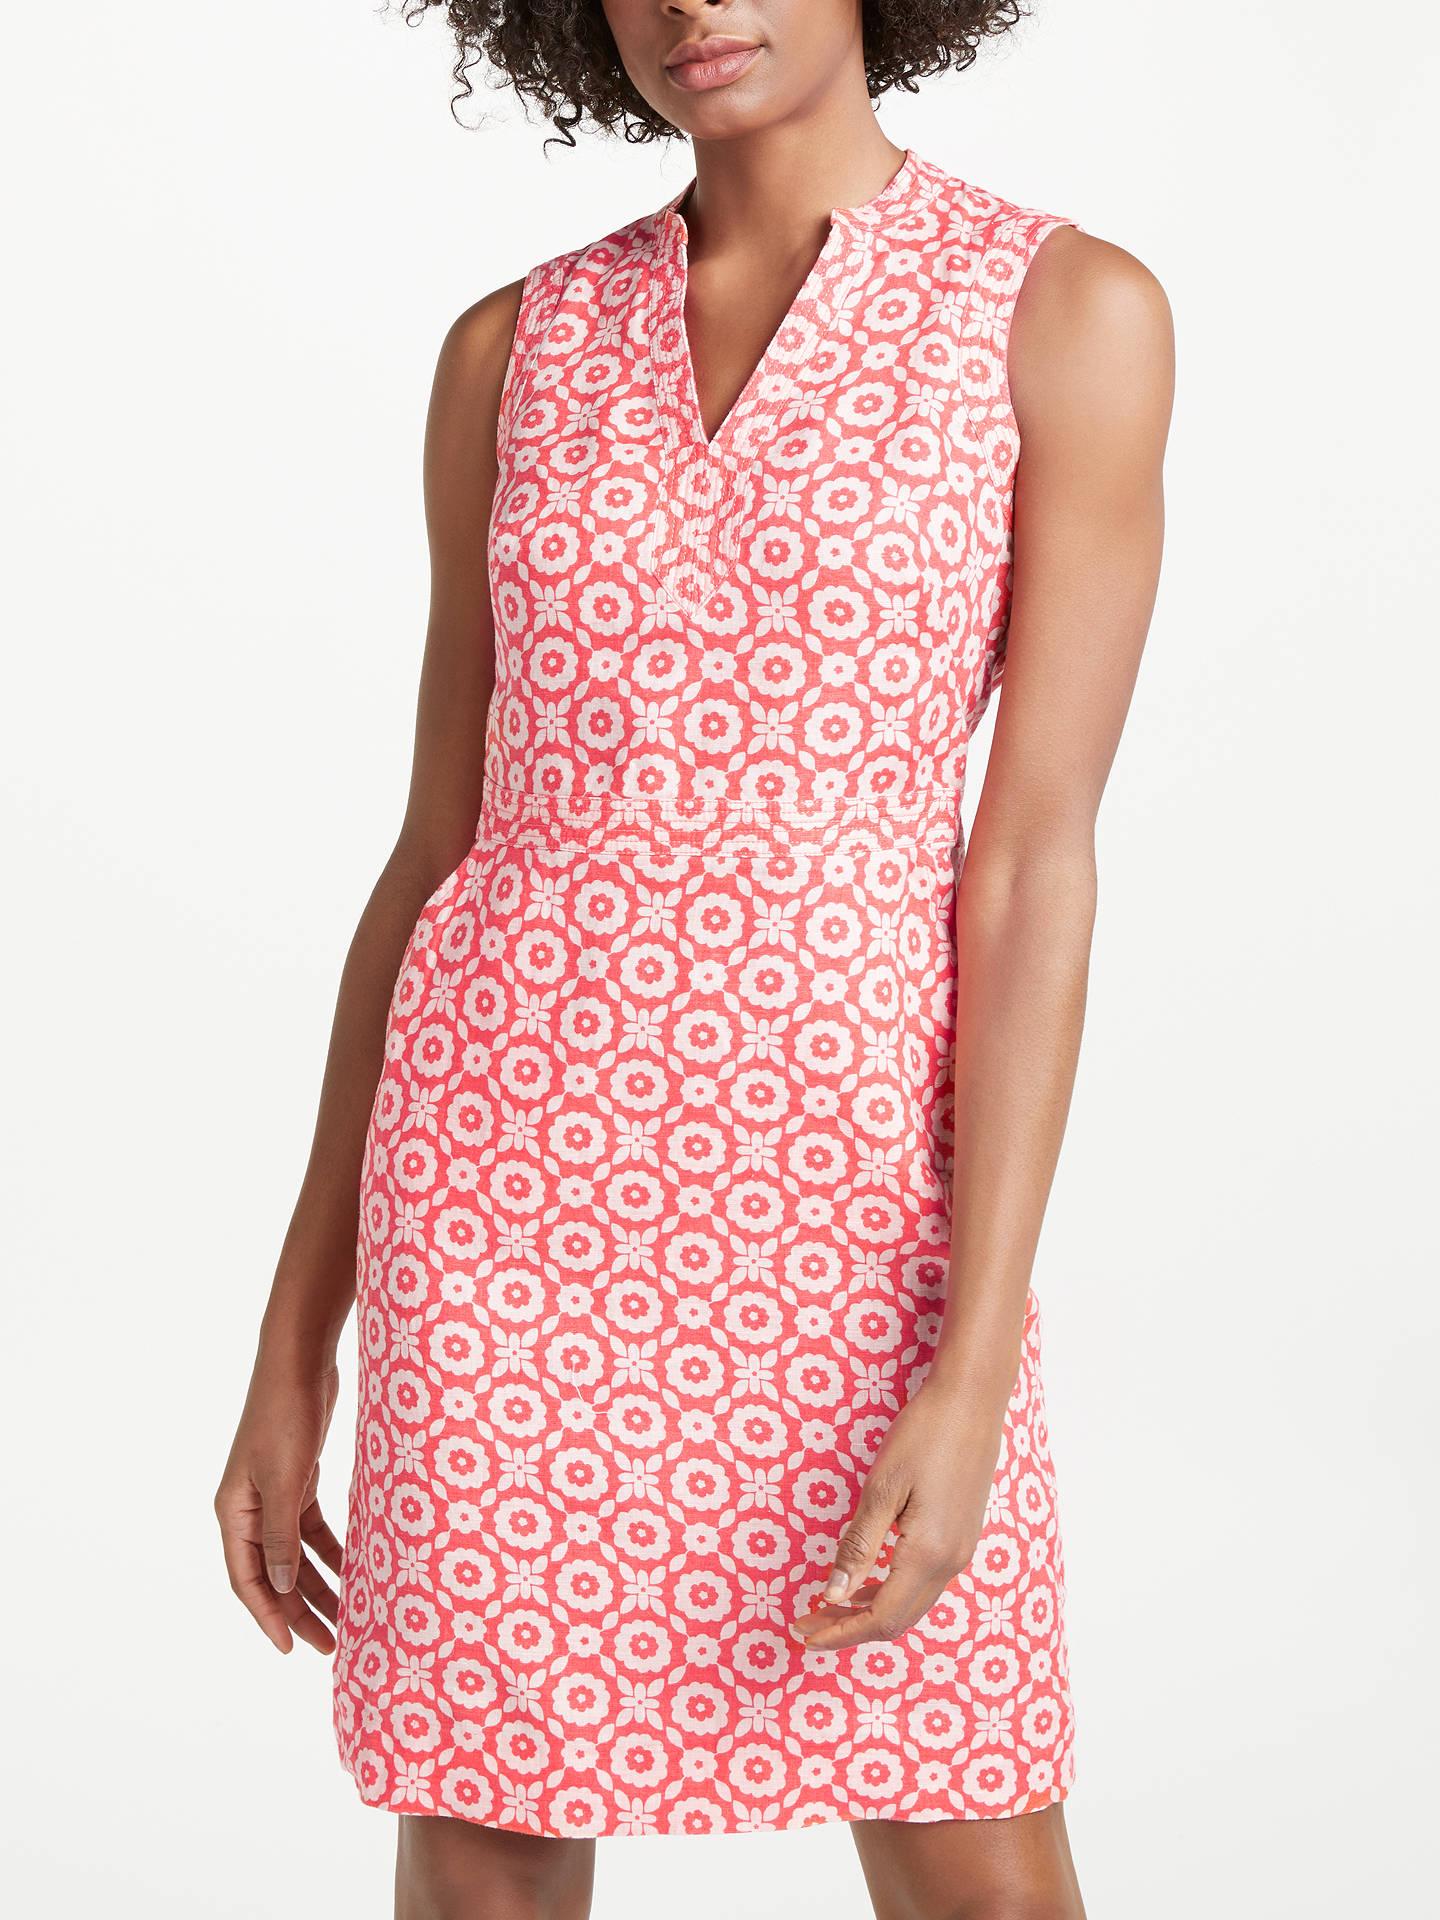 48129153c8 Buy Boden Linen Notch Neck Dress, Rosehip, 8 Online at johnlewis.com ...